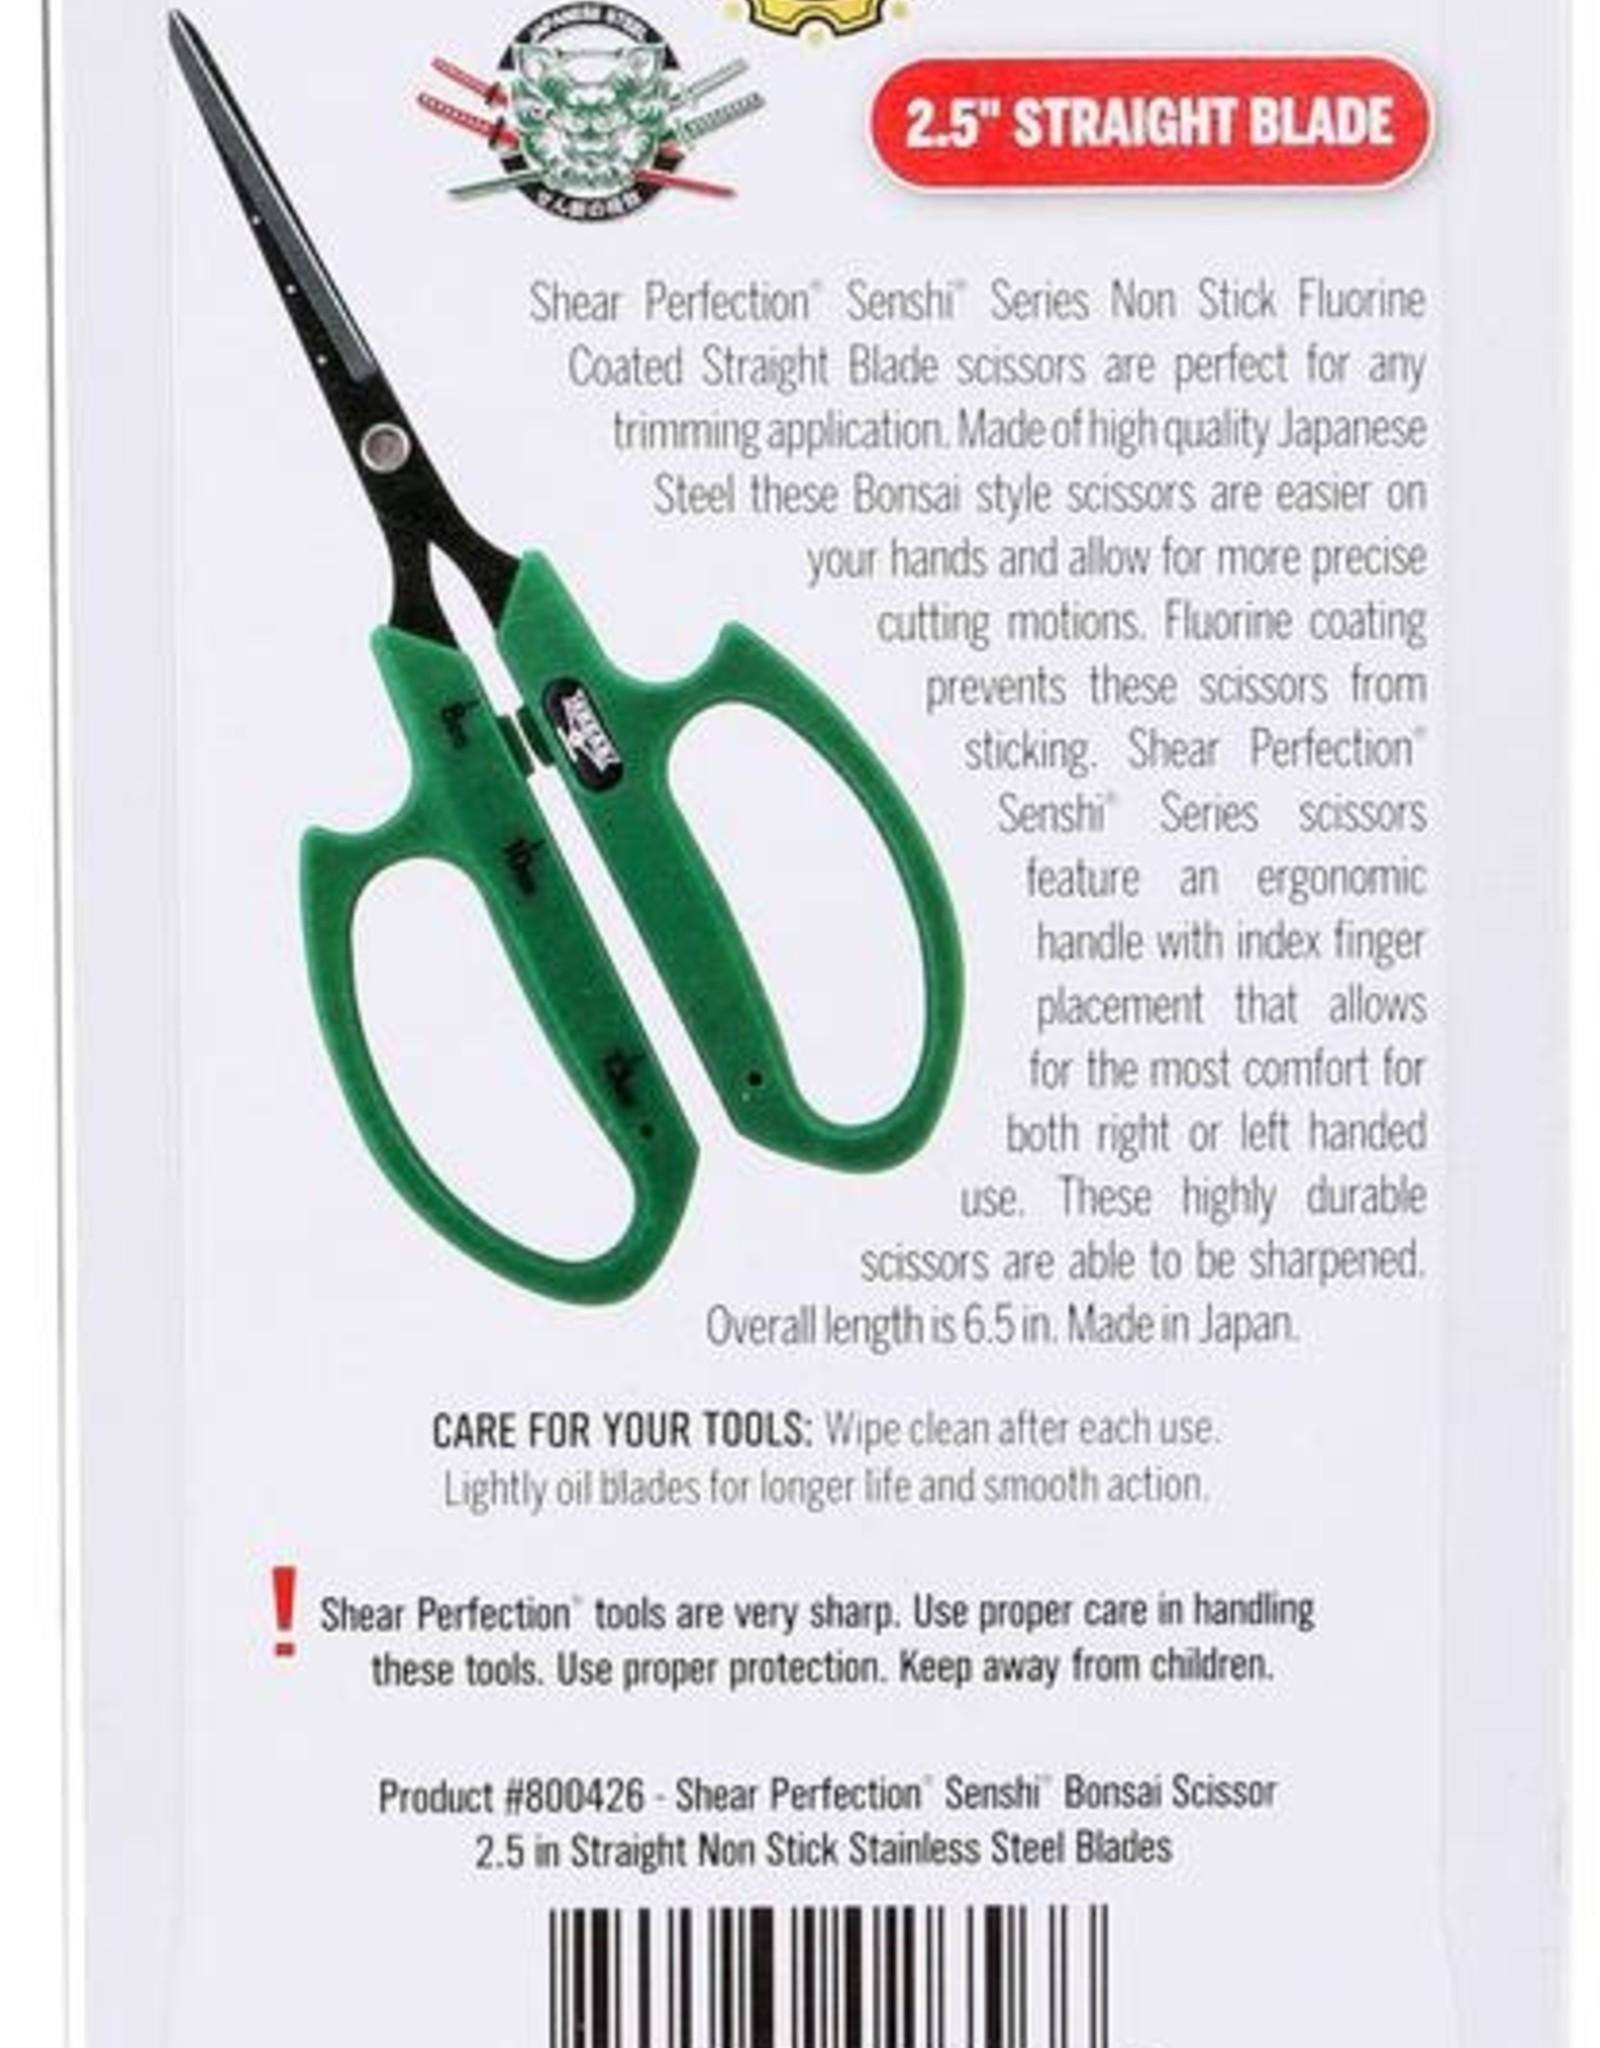 SHEAR PERFECTION Shear Perfection Senshi Non Stick Bonsai Scissor - 2.5 in Straight Blades